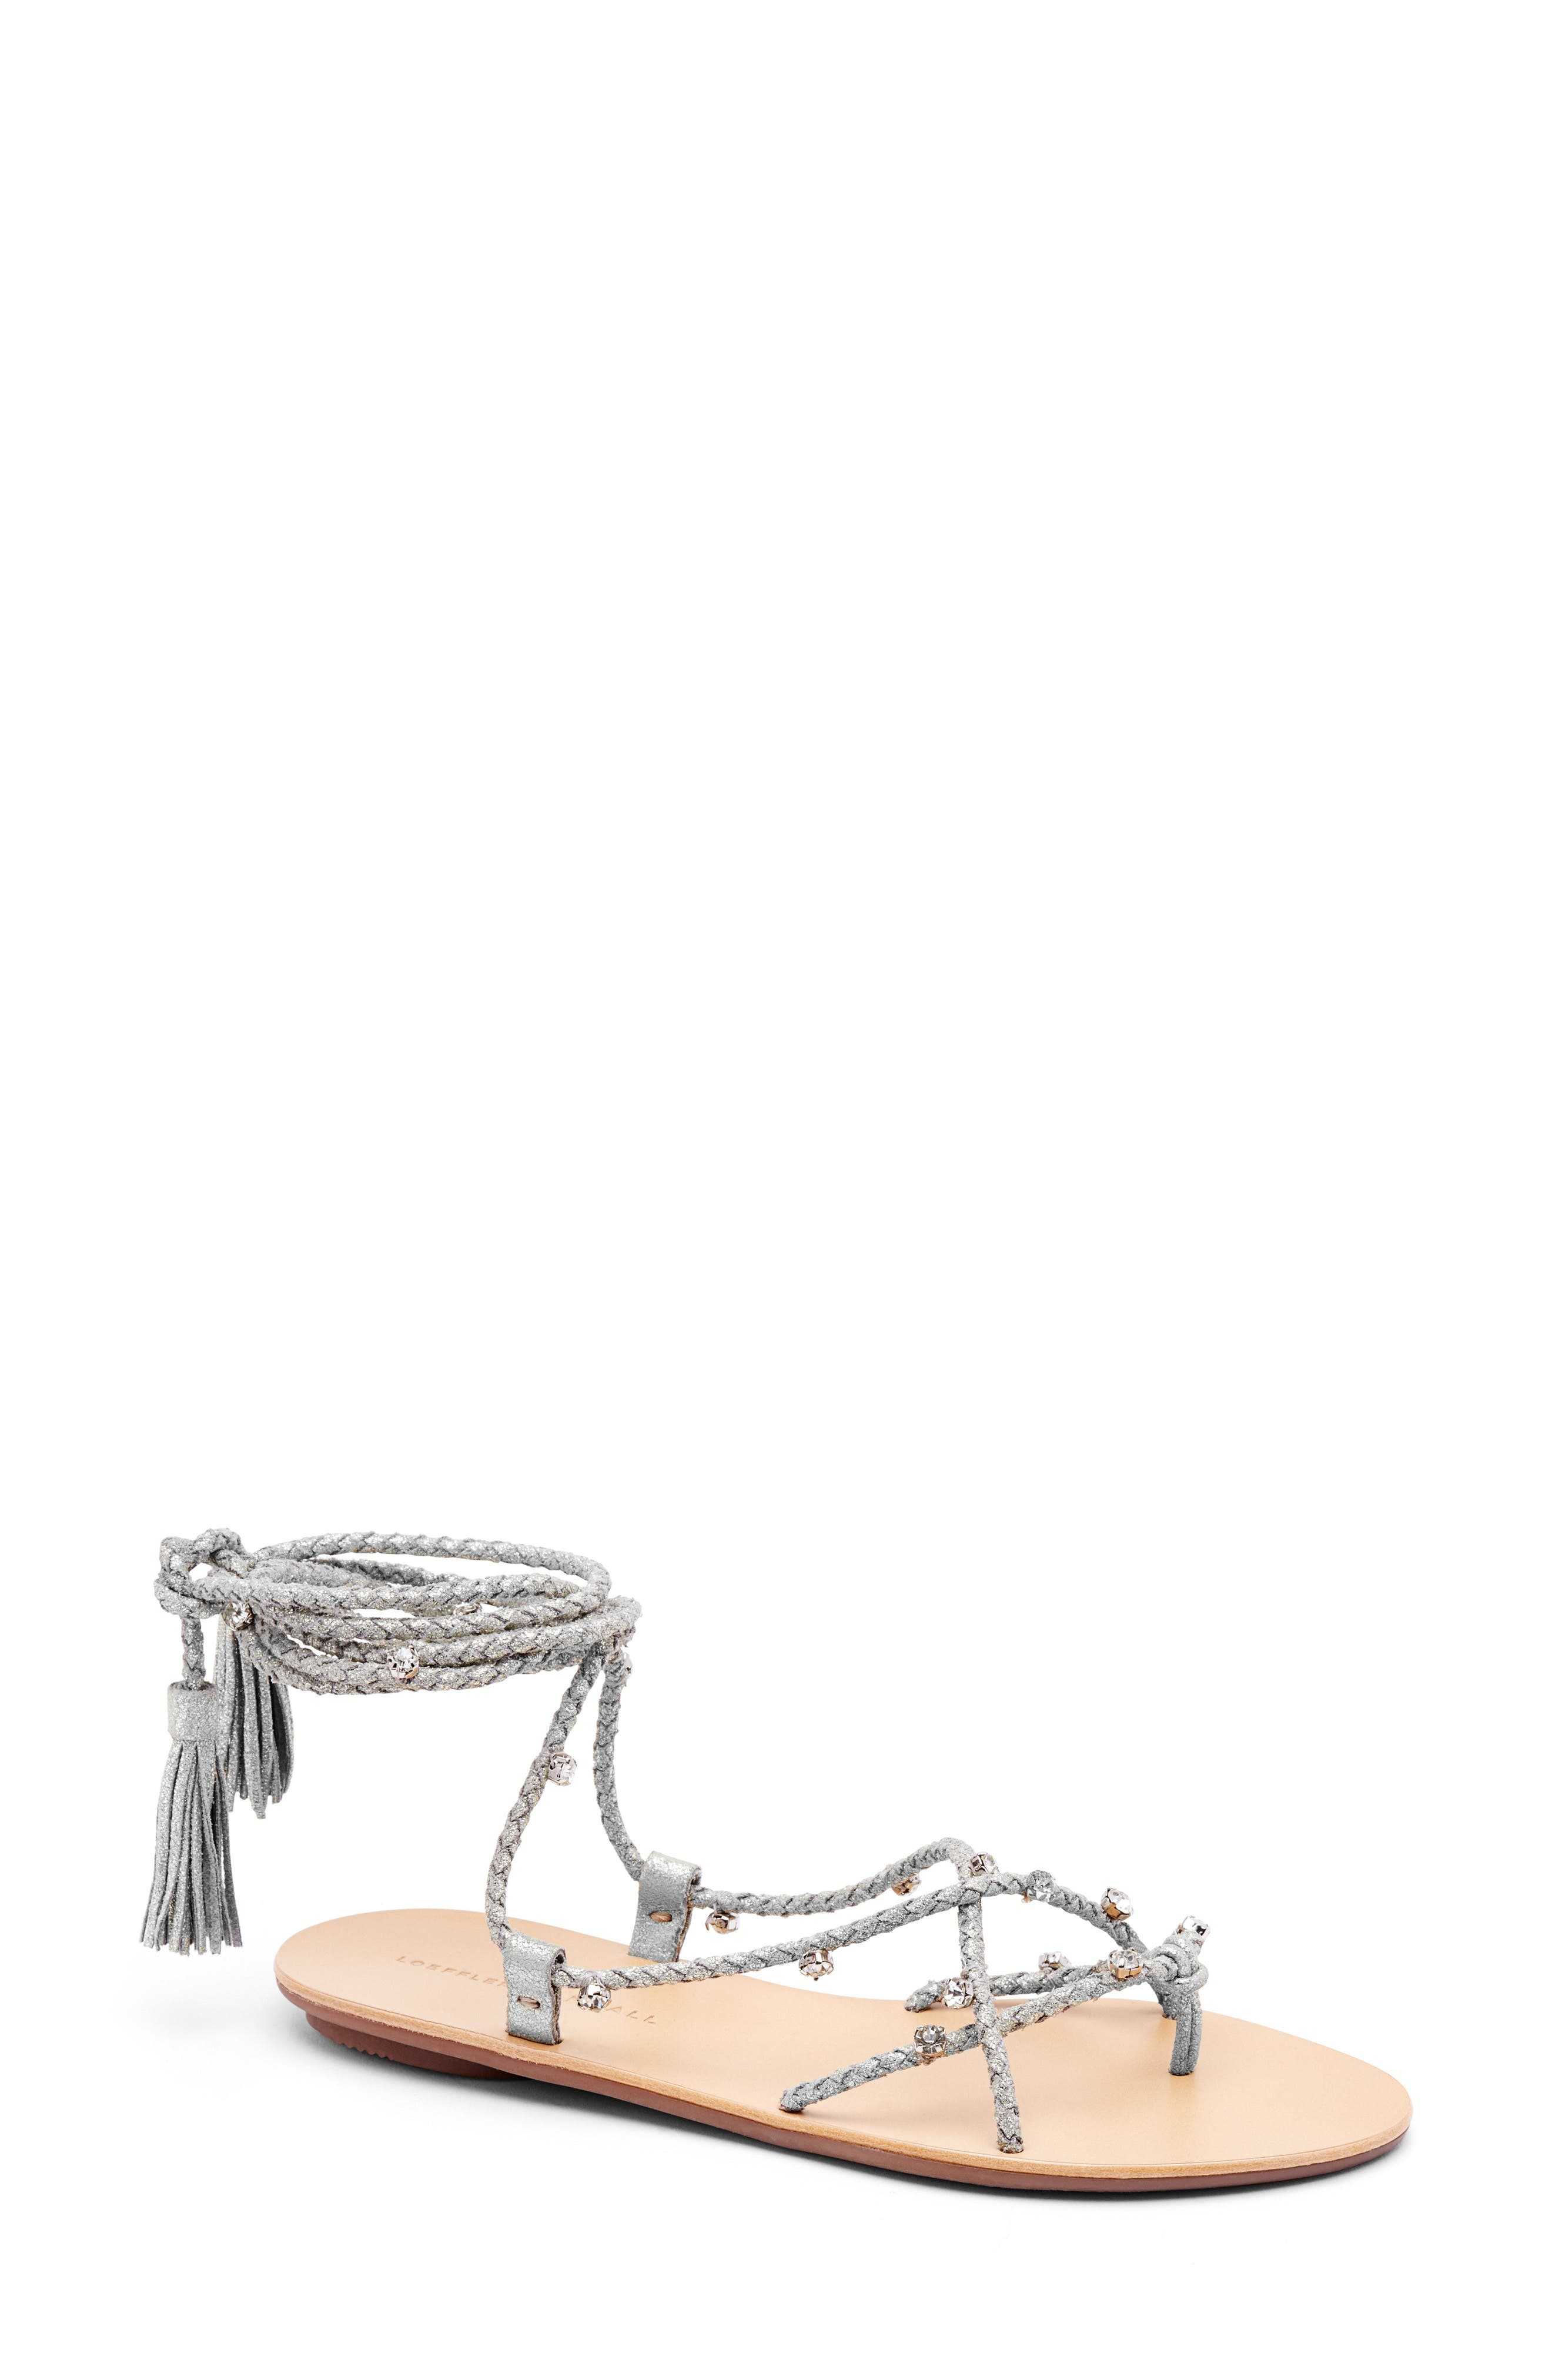 Bo Ankle Wrap Sandal,                             Main thumbnail 1, color,                             040